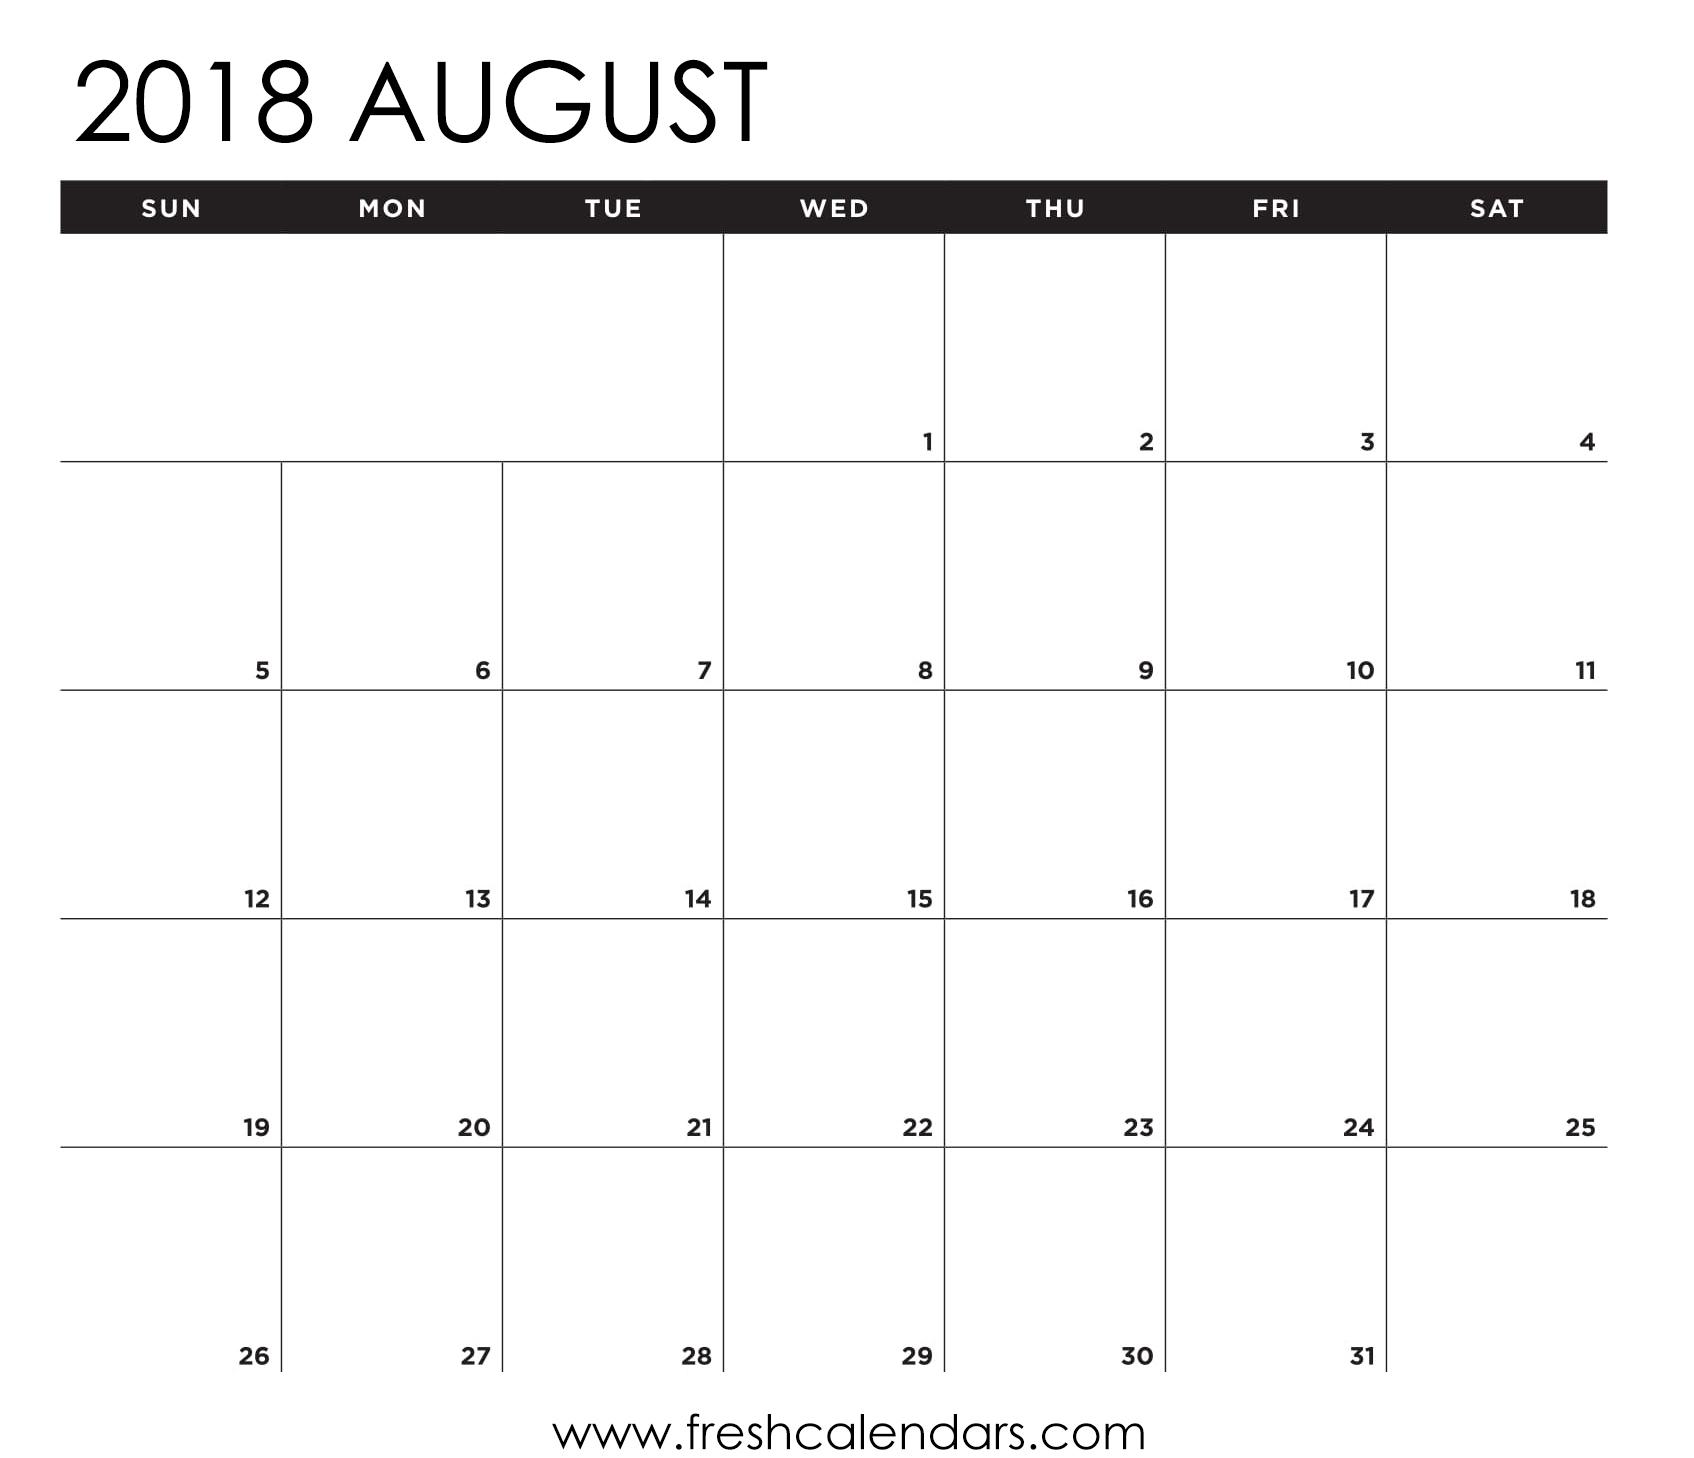 August 2018 Calendar Printable - Fresh Calendars within Blank Calender August Printable